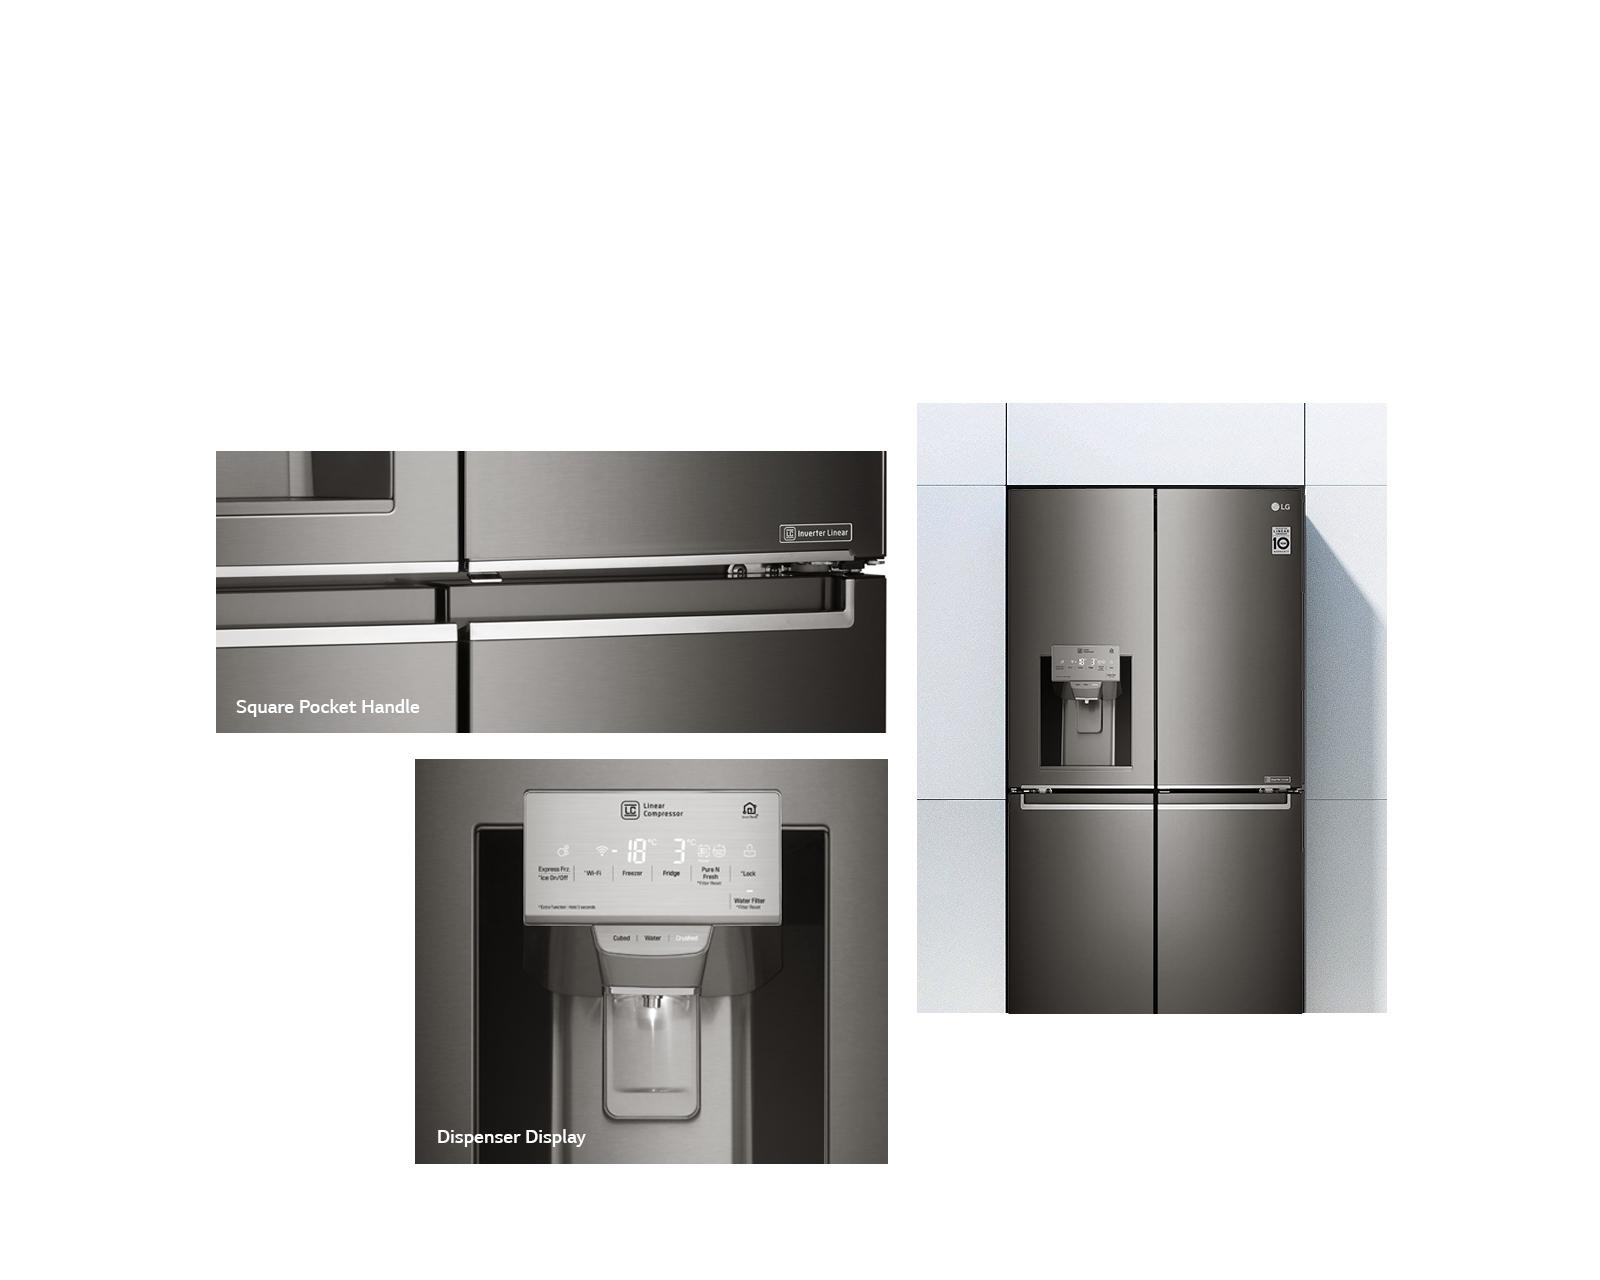 LG 708L French Door Fridge Buy line Heathcote Appliances